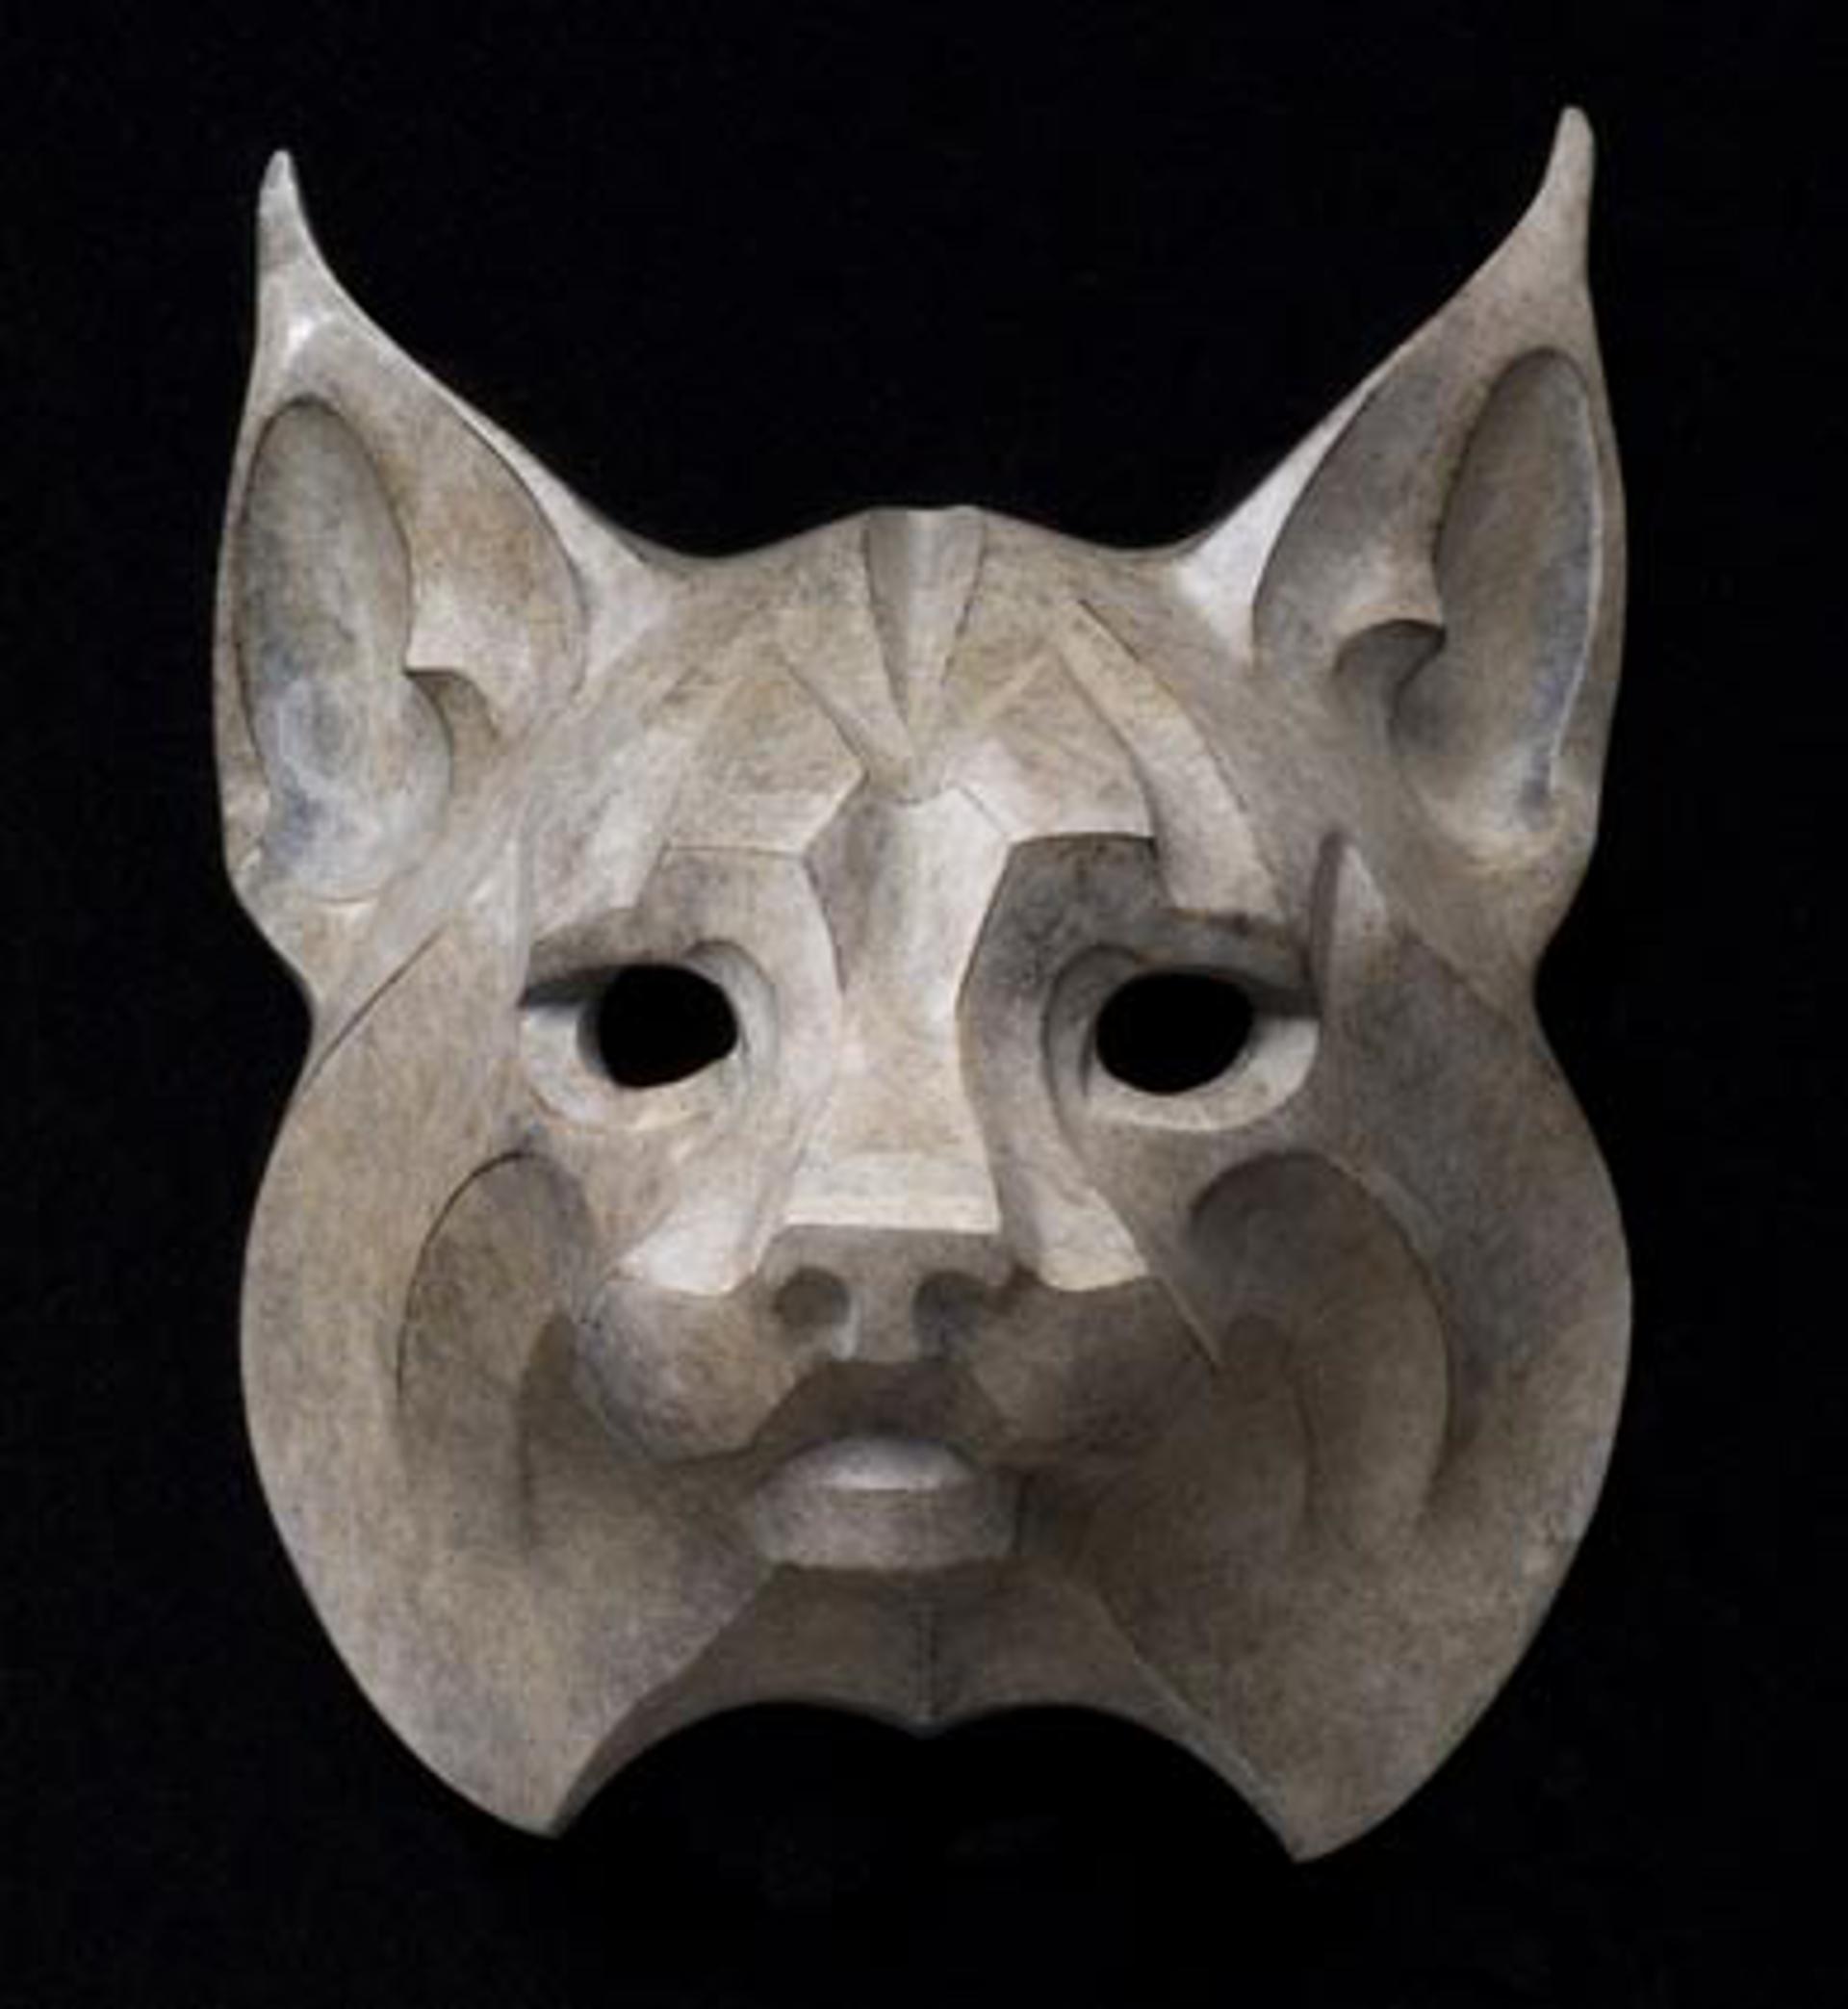 Bobcat Mask Maquette by Rosetta